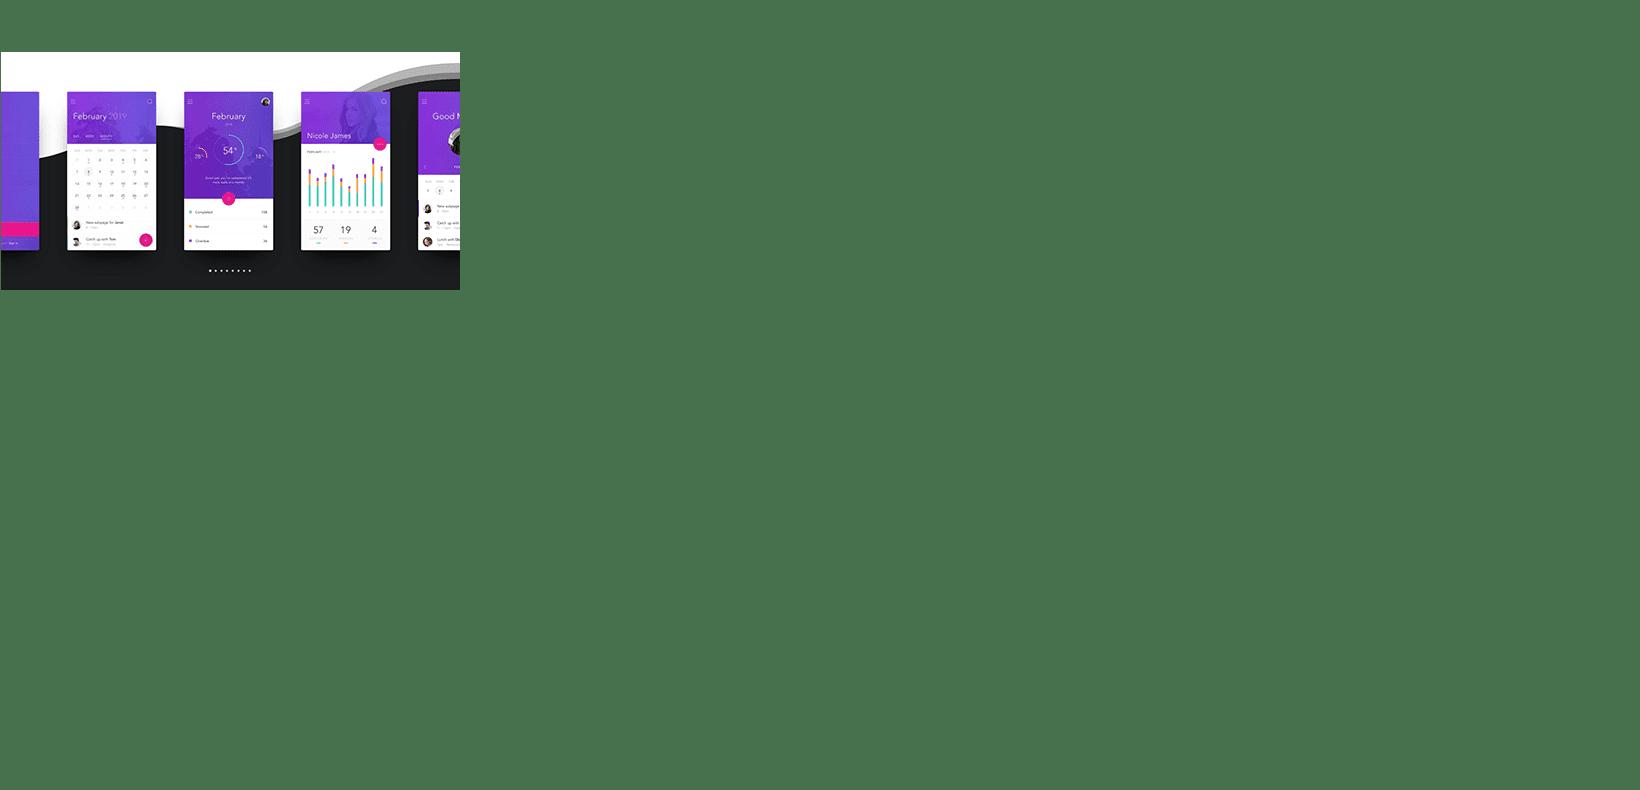 layer-image-2